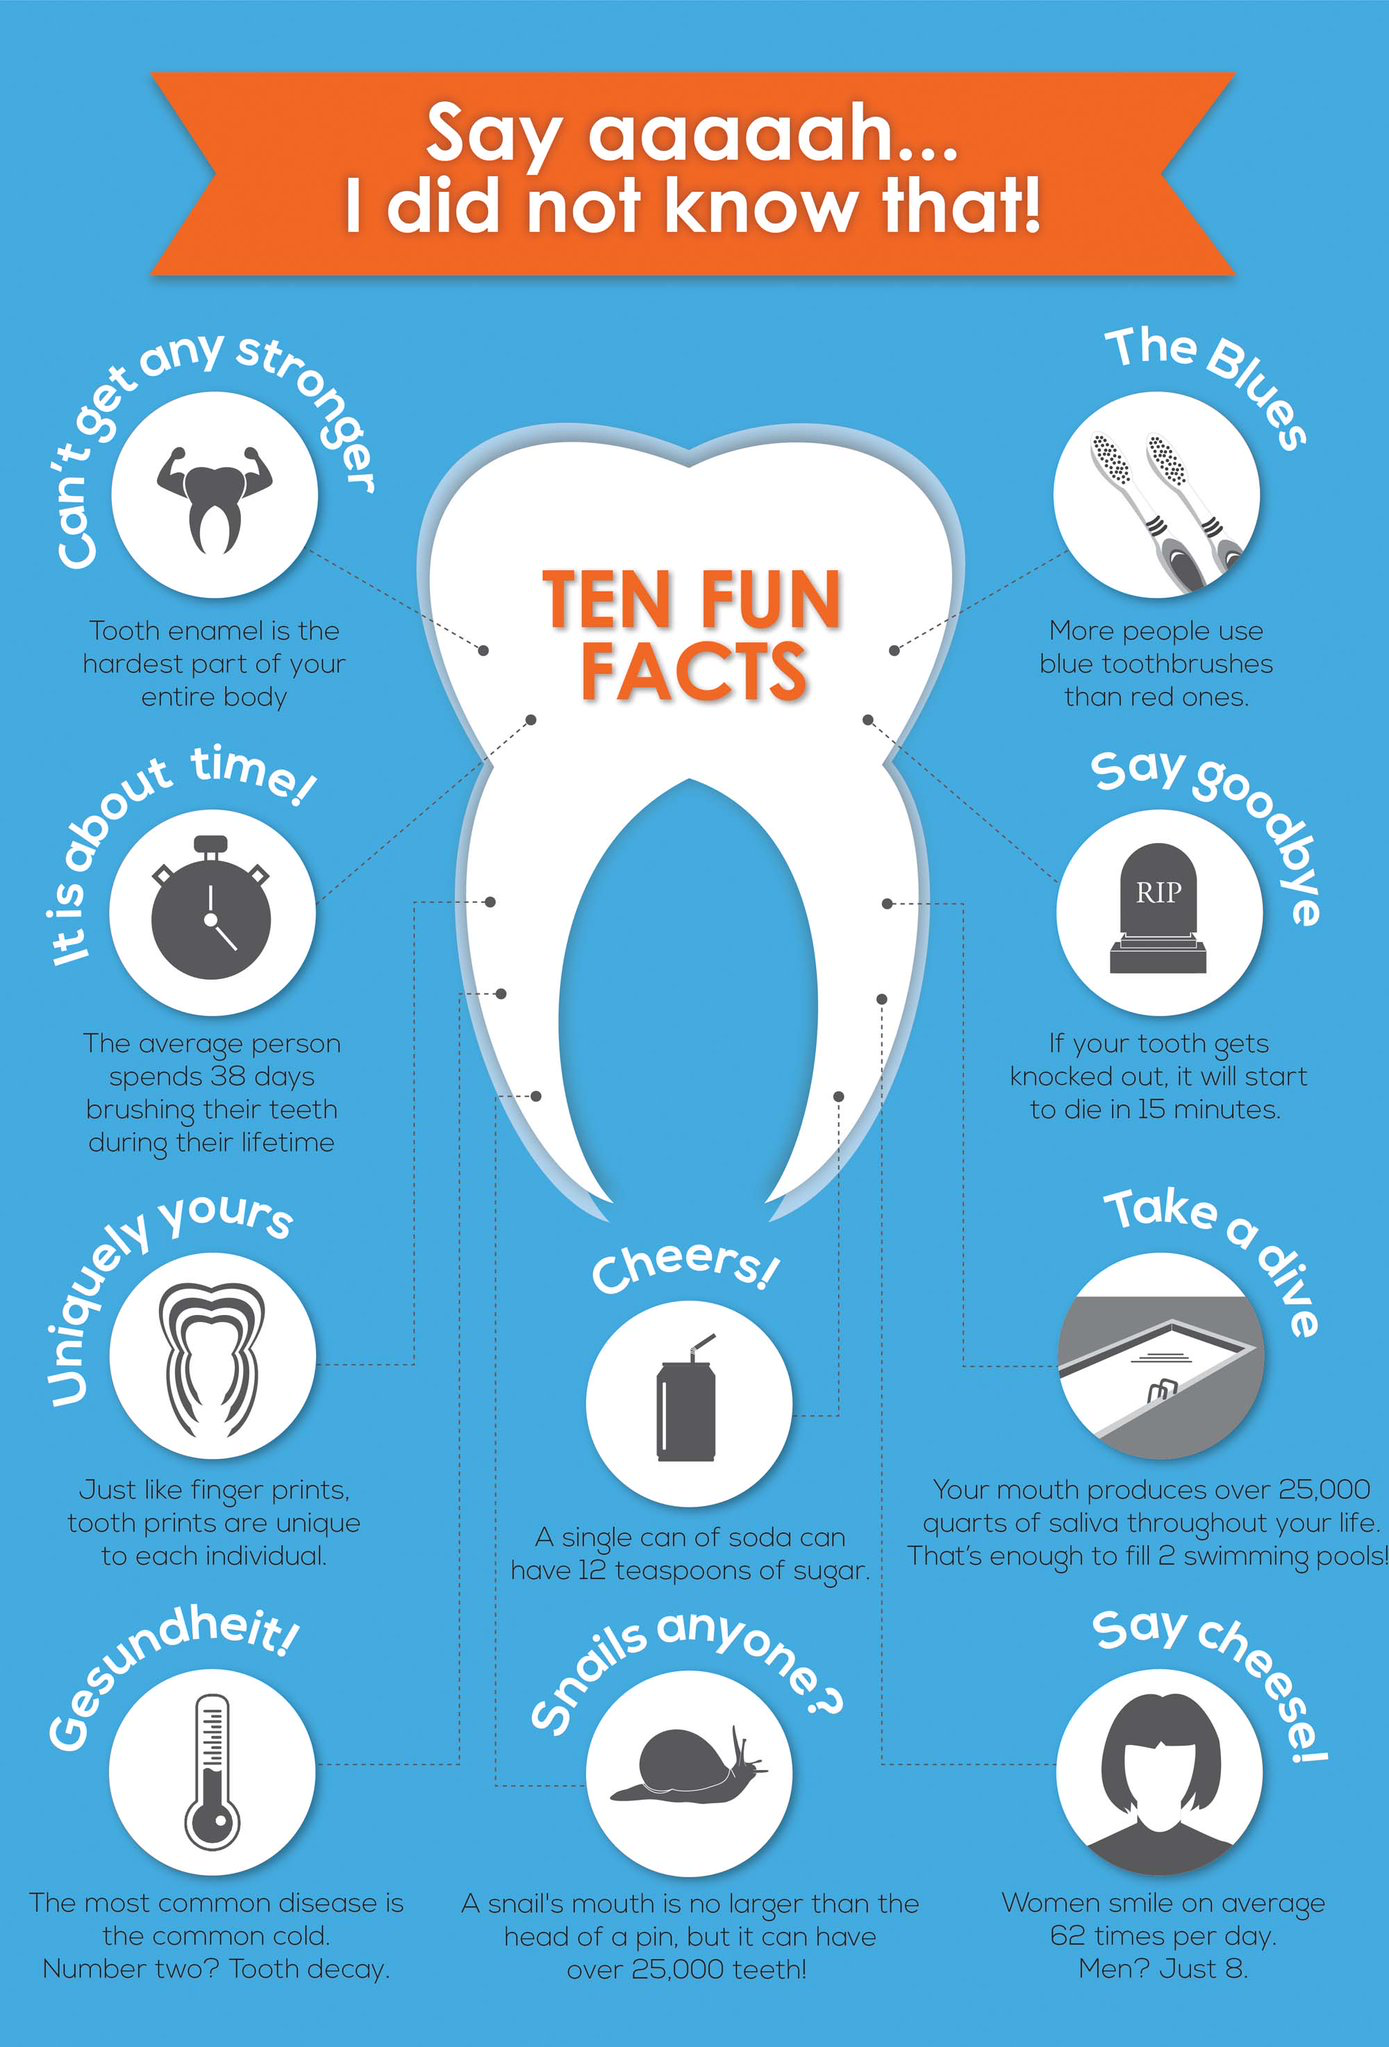 dentistry #dental | Patient education | Dental fun facts